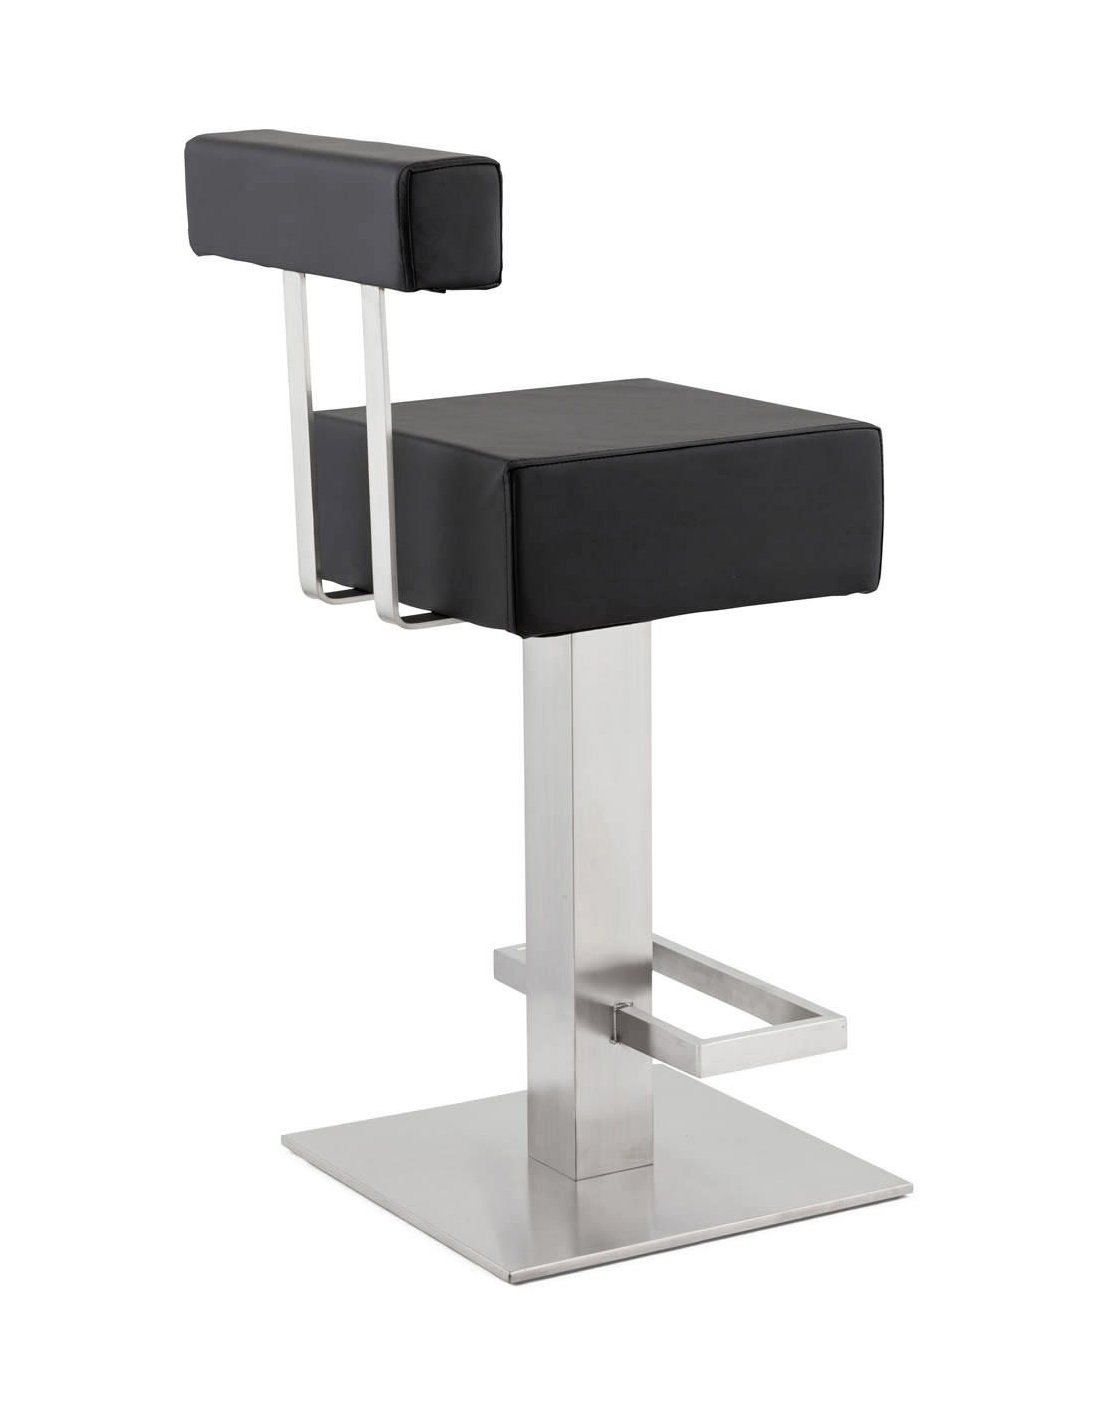 tabouret de bar design noble mini kokoon design noir. Black Bedroom Furniture Sets. Home Design Ideas